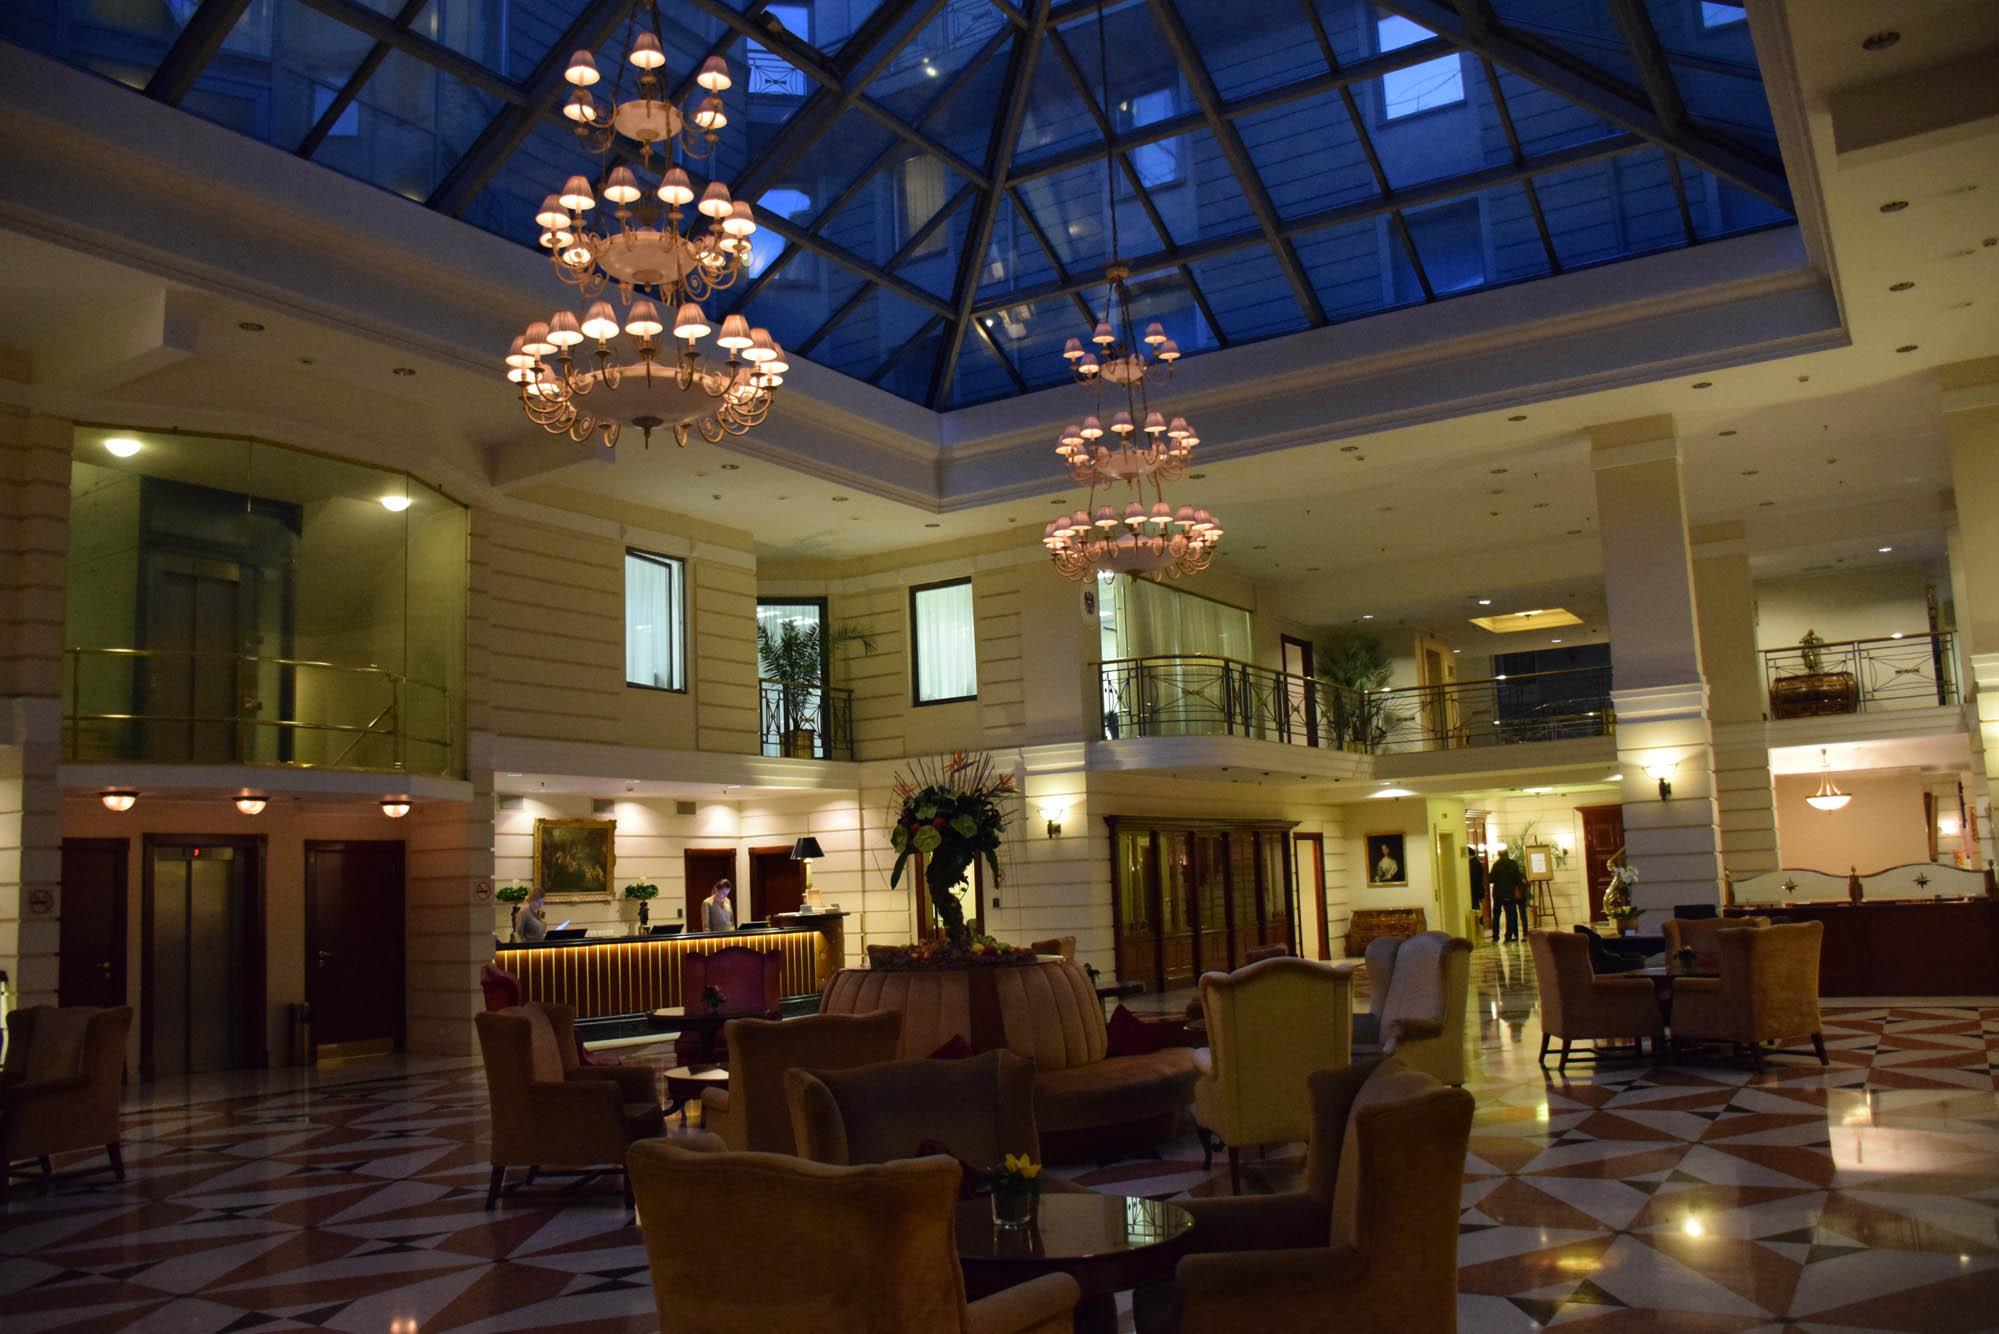 Kempinski Hotel Moika 22 ST PETERSBURG onde ficar hotéis russia 03